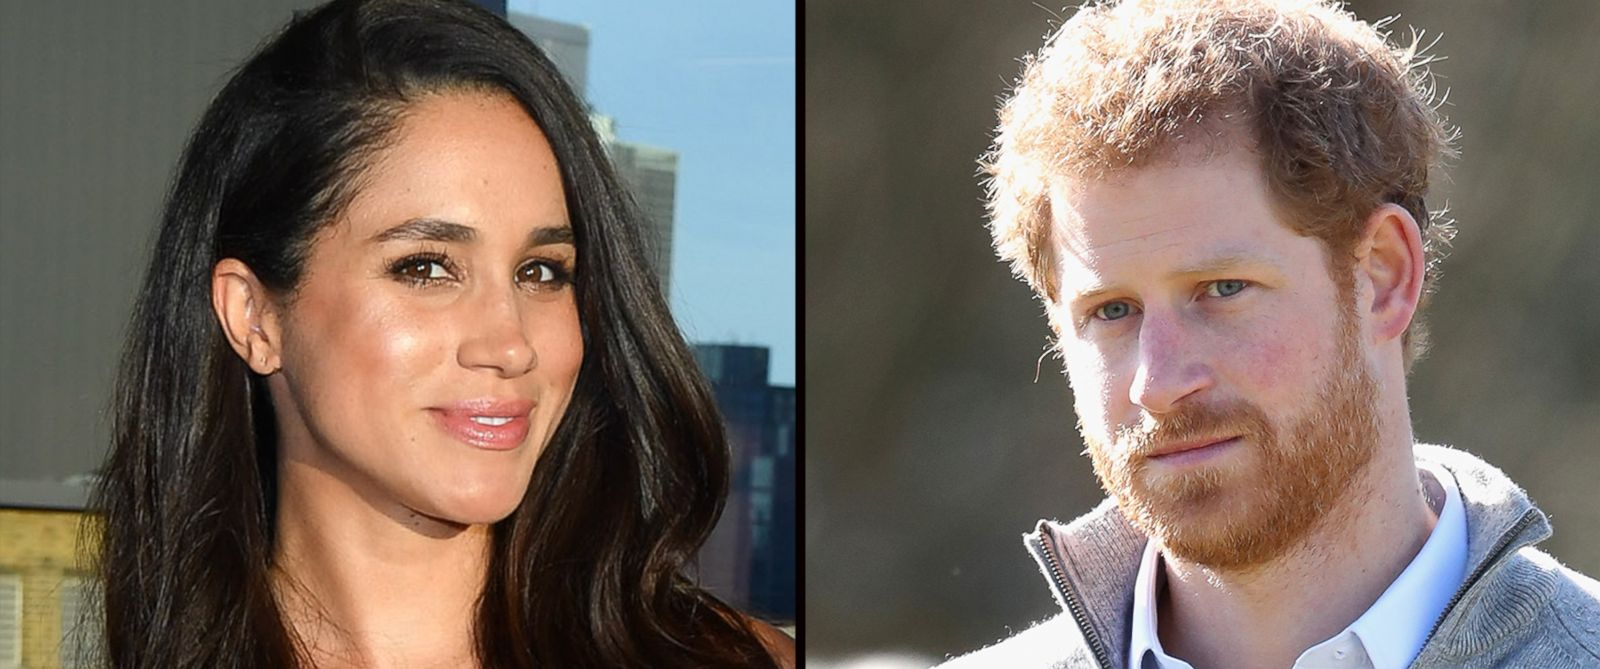 Meghan Markle Accompanies Prince Harry To Pippa Middleton